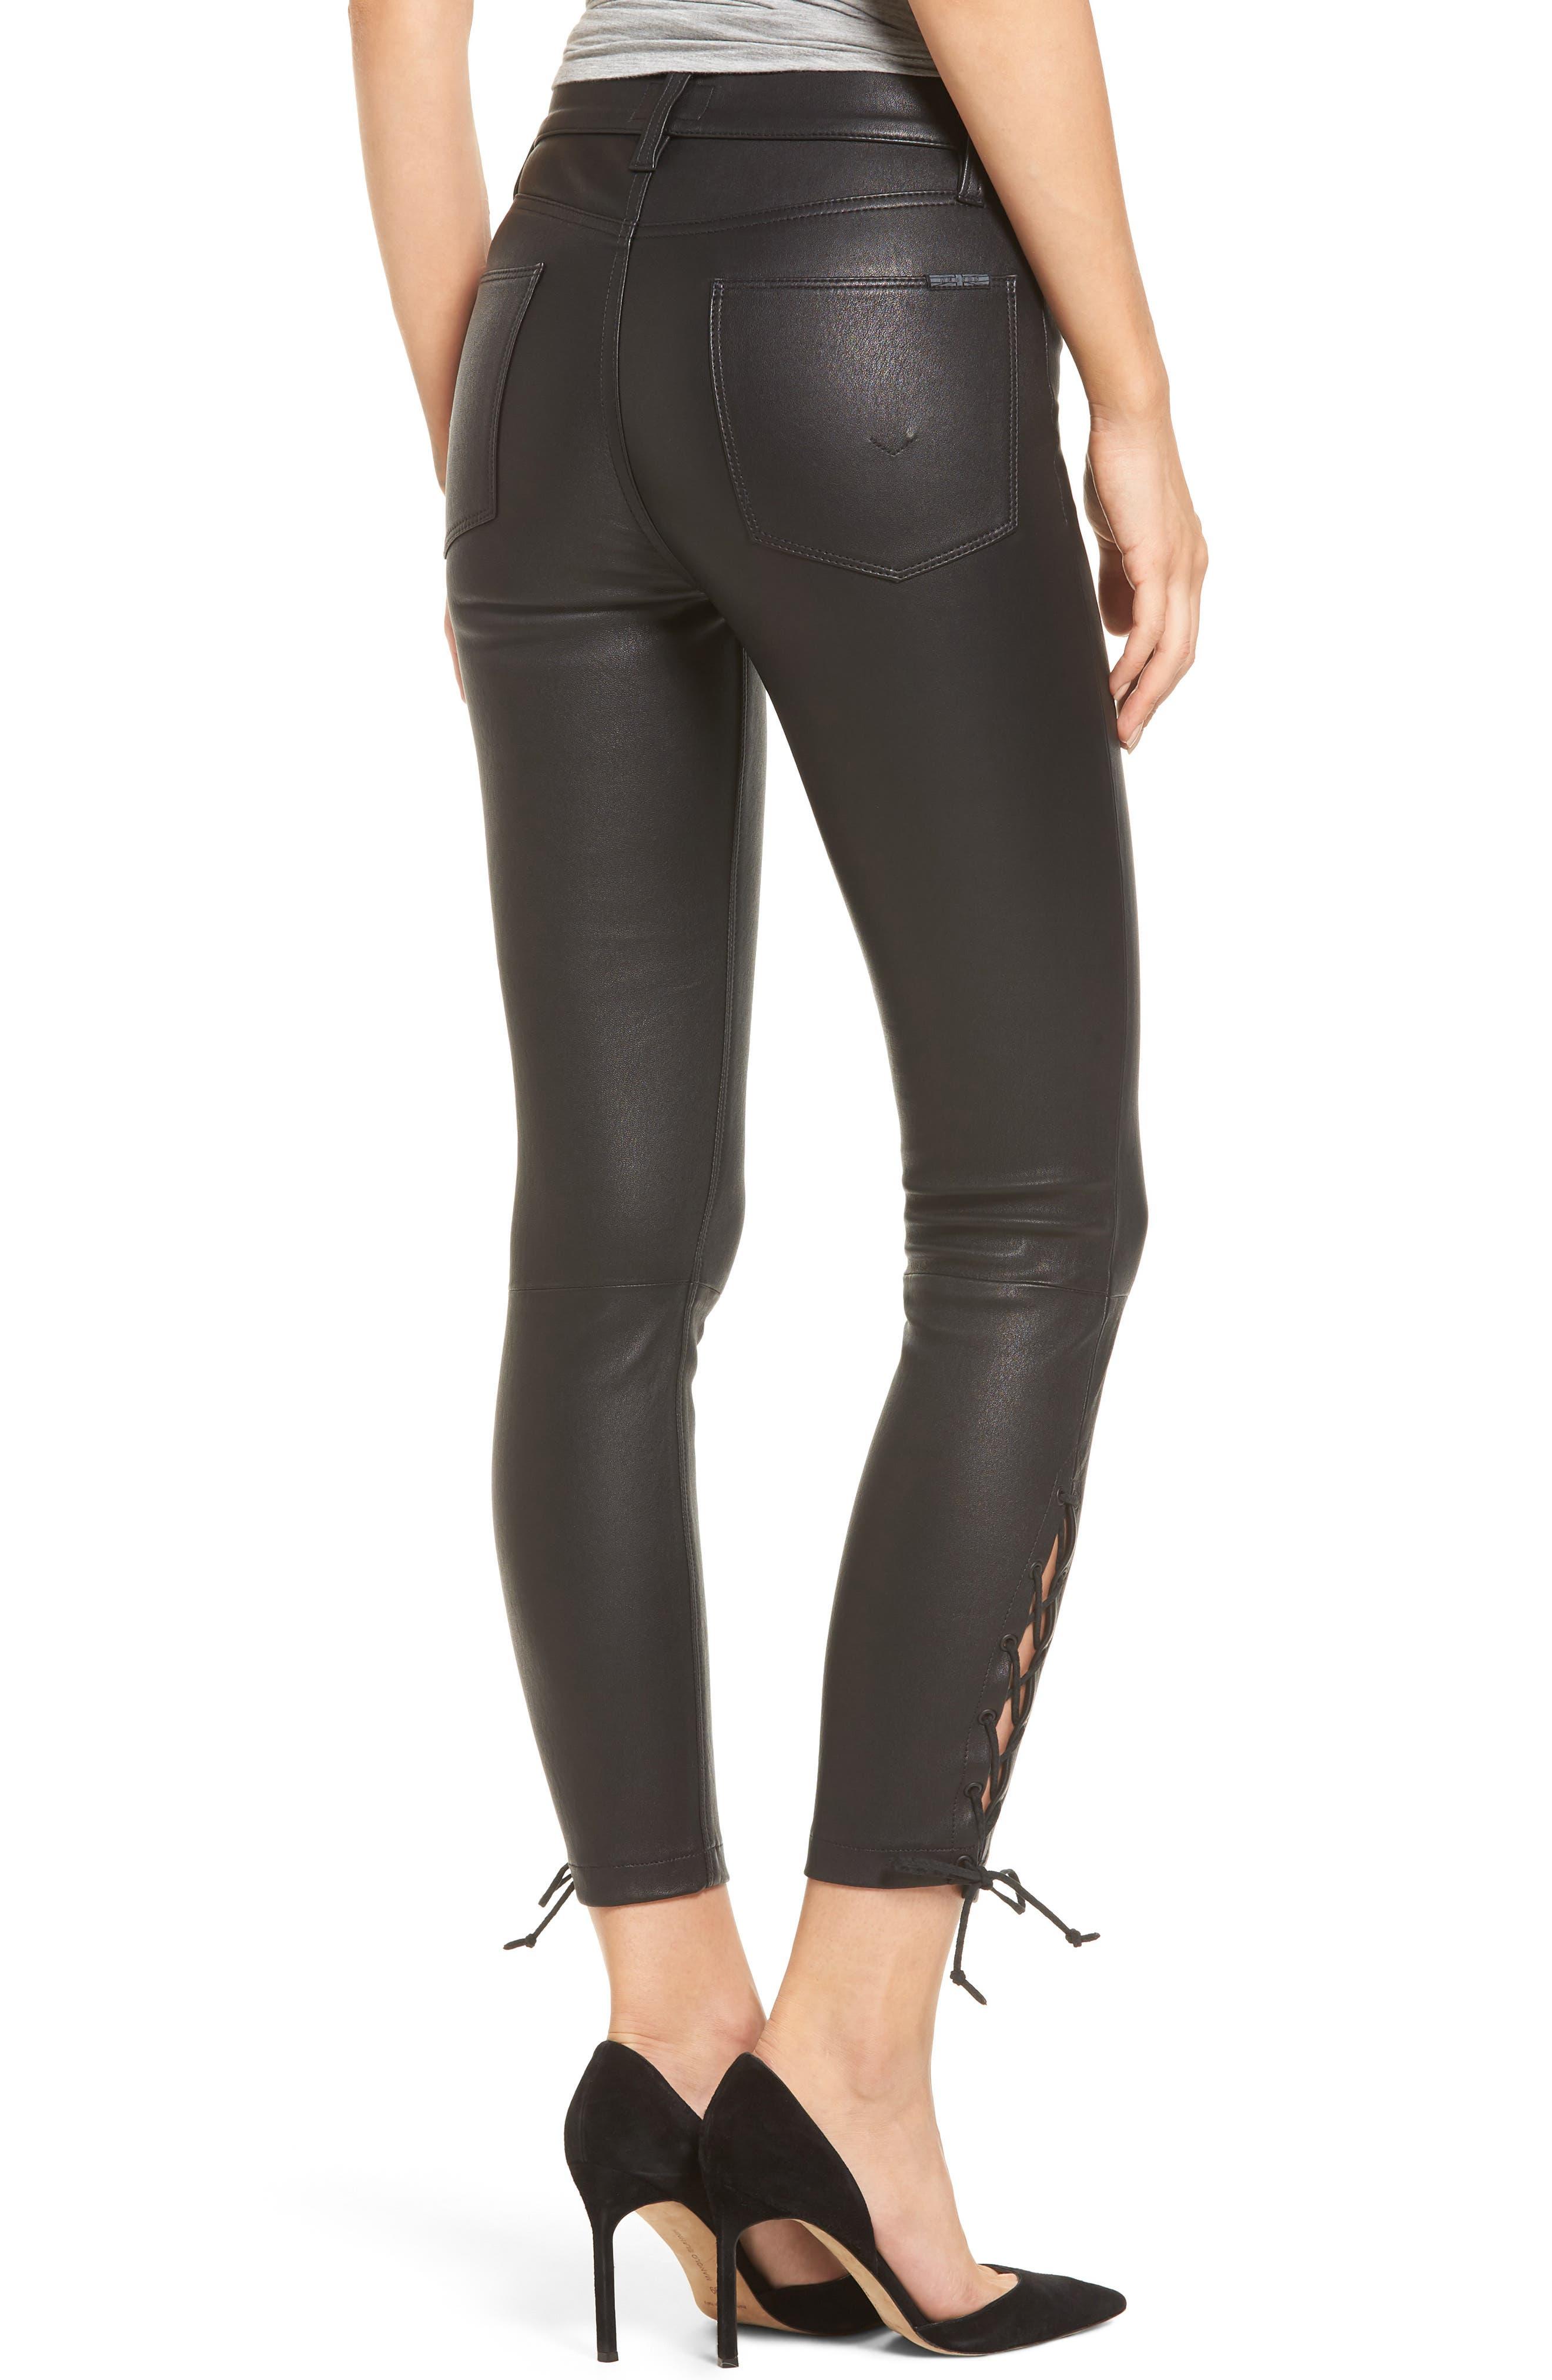 Nix High Waist Leather Skinny Pants,                             Alternate thumbnail 2, color,                             001